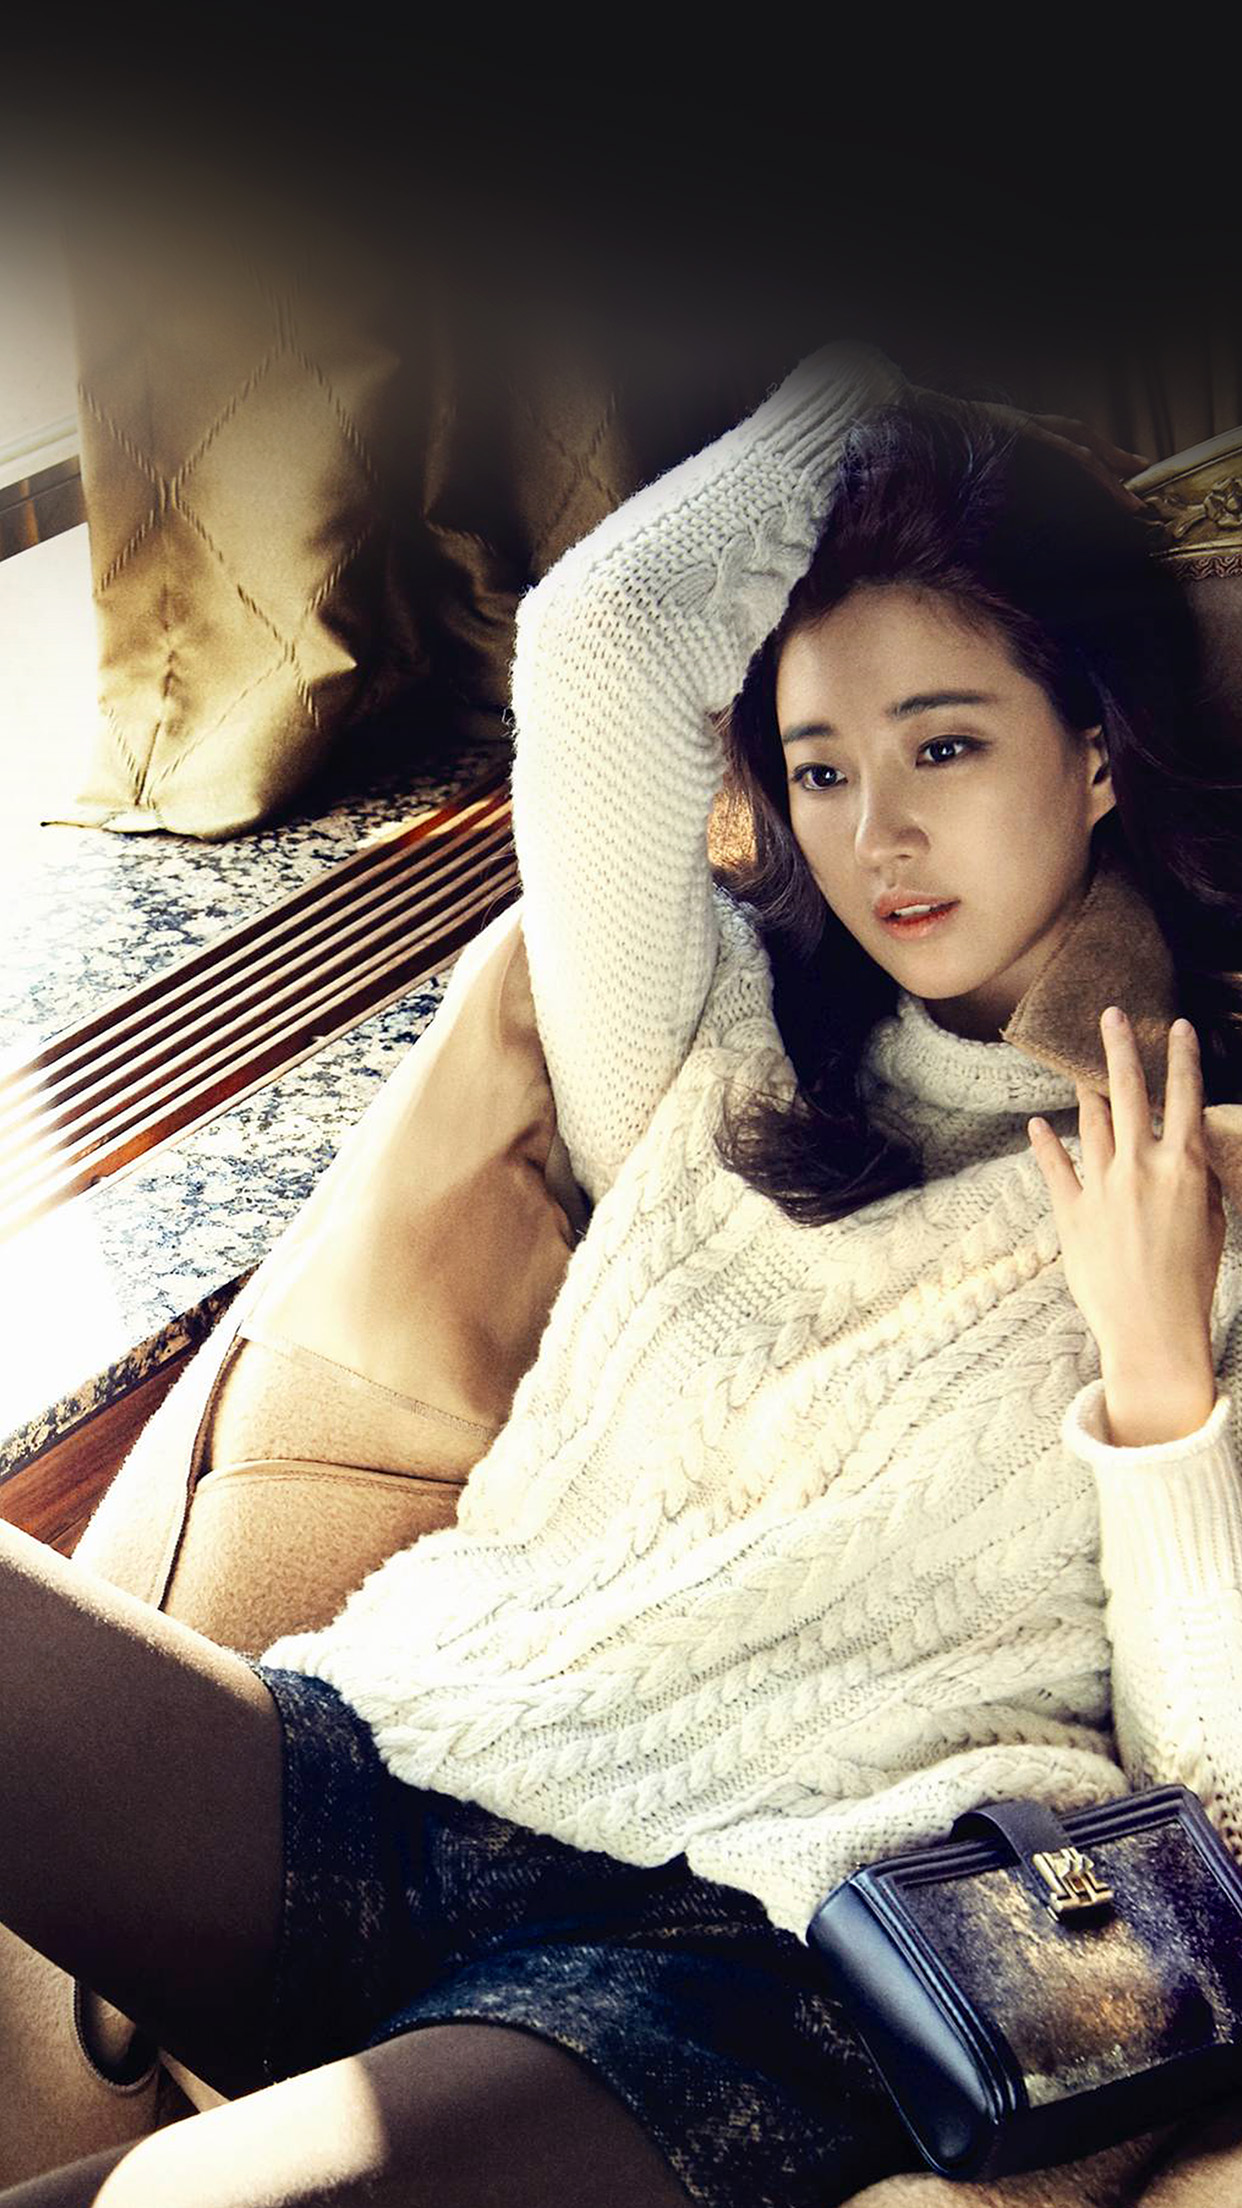 Car And Girl Iphone Wallpaper Hh17 Sarang Kim Kpop Girl Photoshoot Papers Co